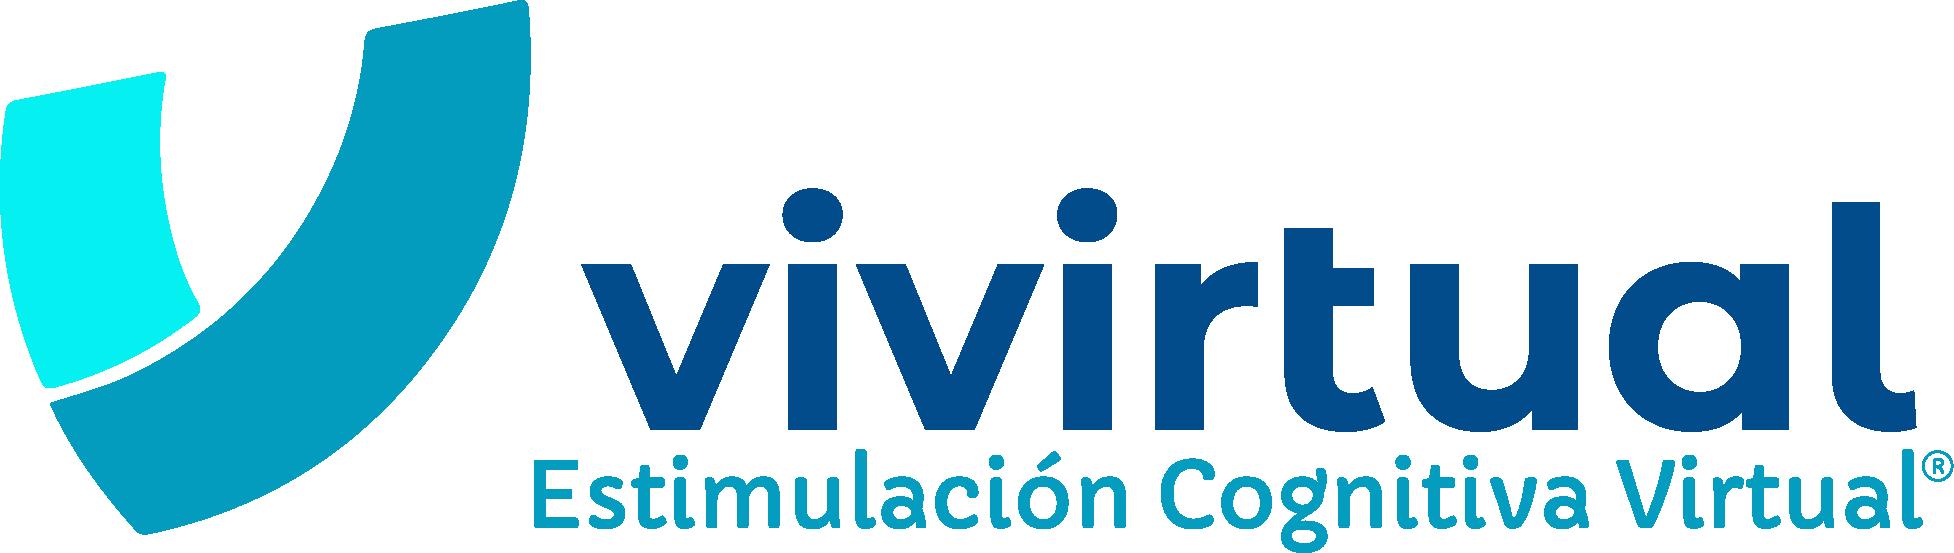 Vivirtual